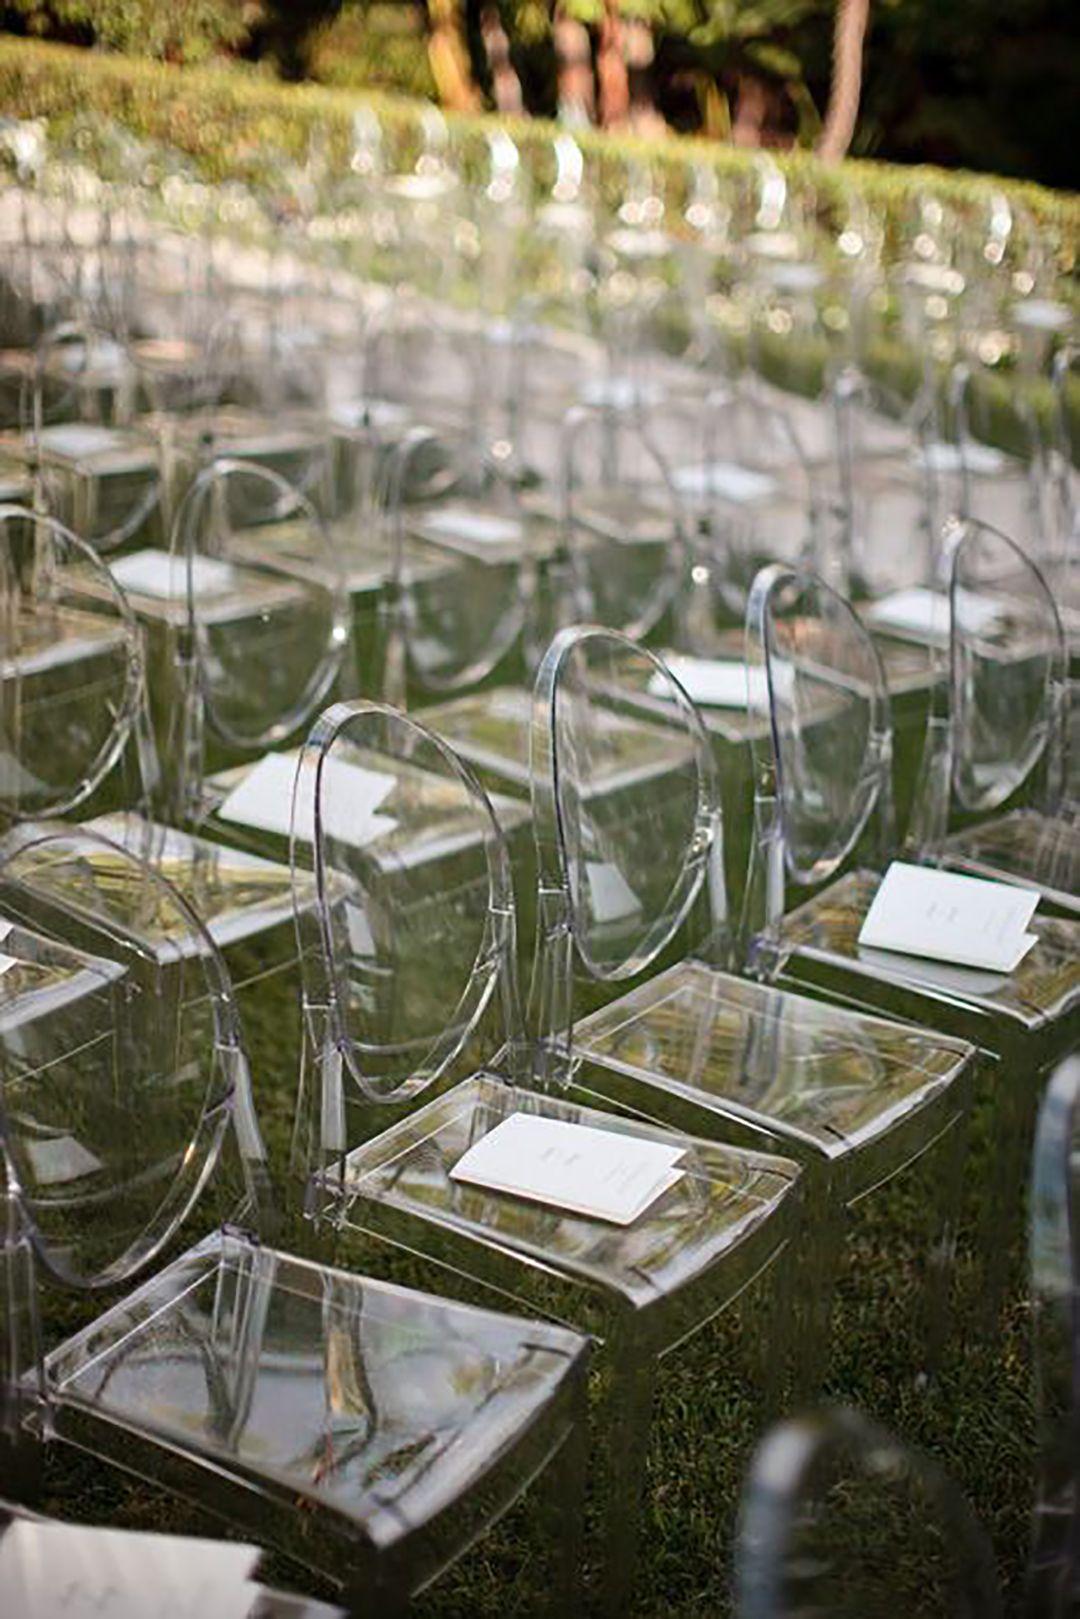 Sheer Delight Acrylic Wedding Decor Details